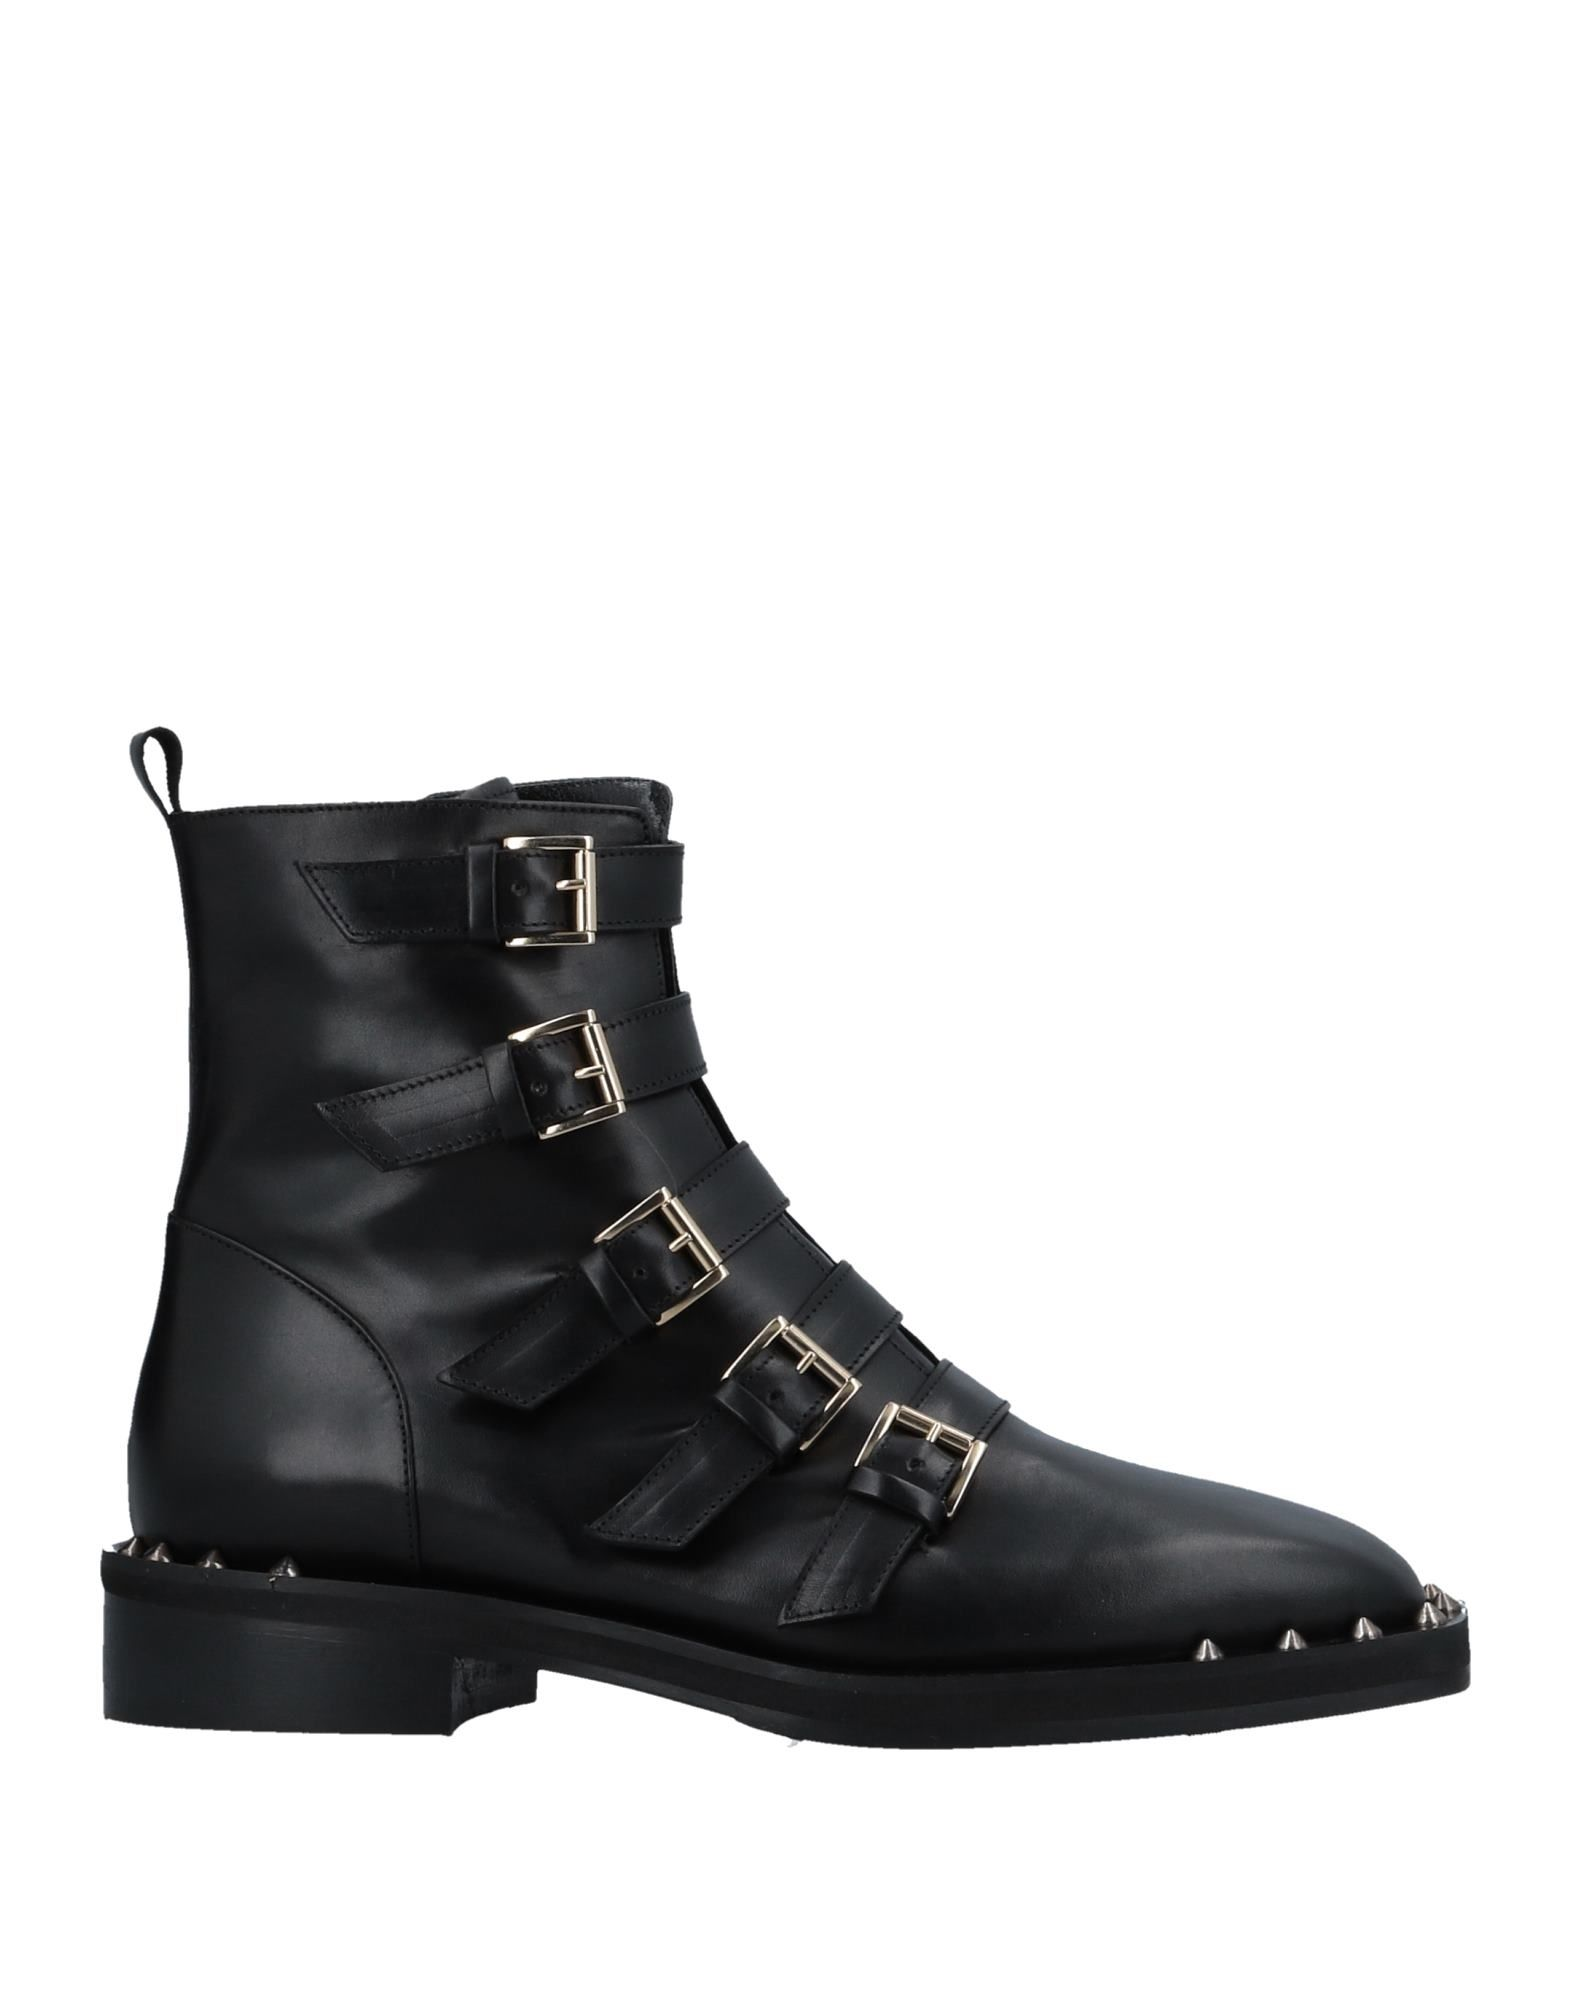 Stilvolle Douaré billige Schuhe Elian Douaré Stilvolle Stiefelette Damen  11511797RA 6c0363